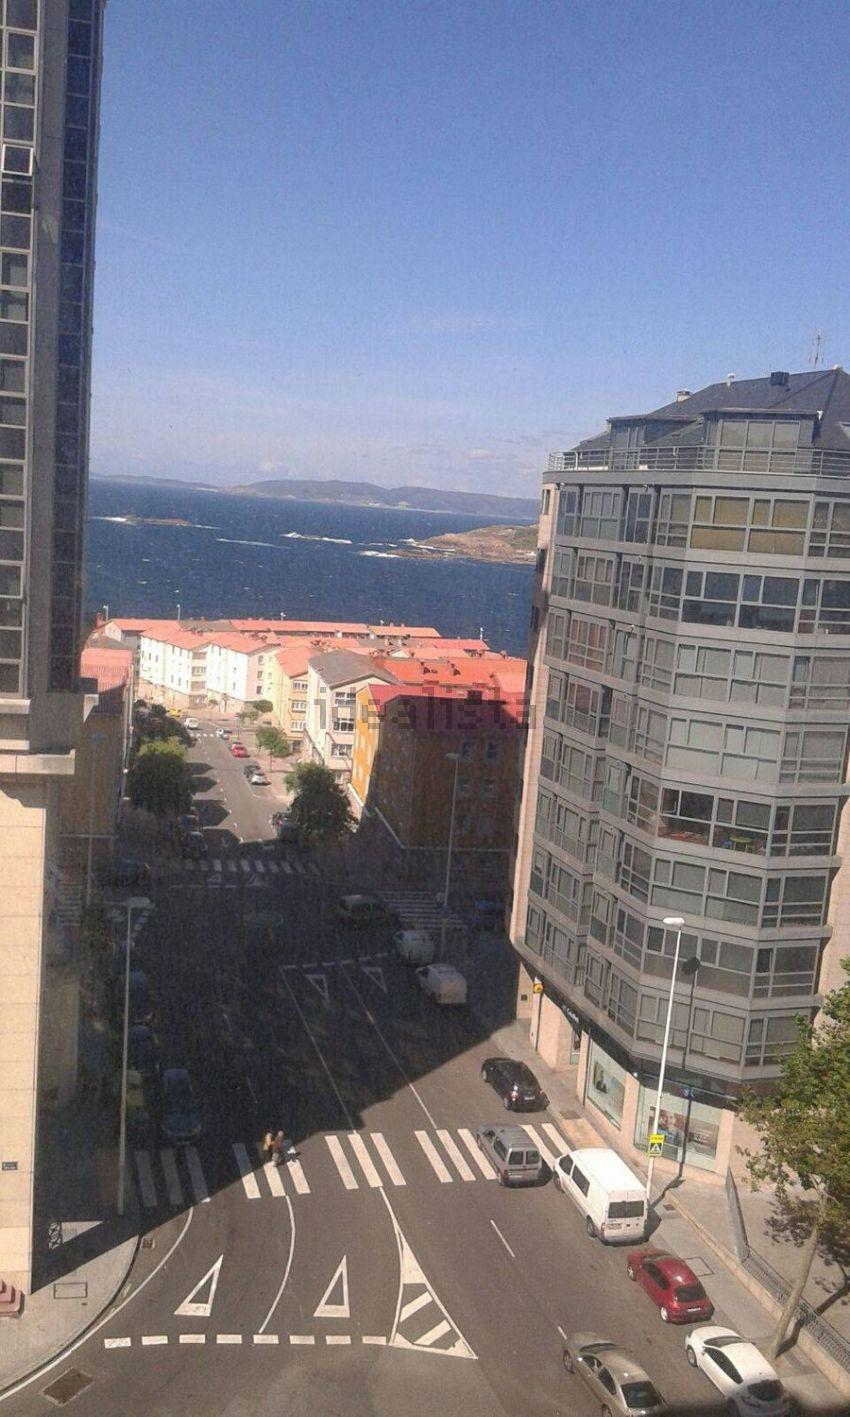 Piso en ronda OUTEIRO, Riazor - Los Rosales, A Coruña